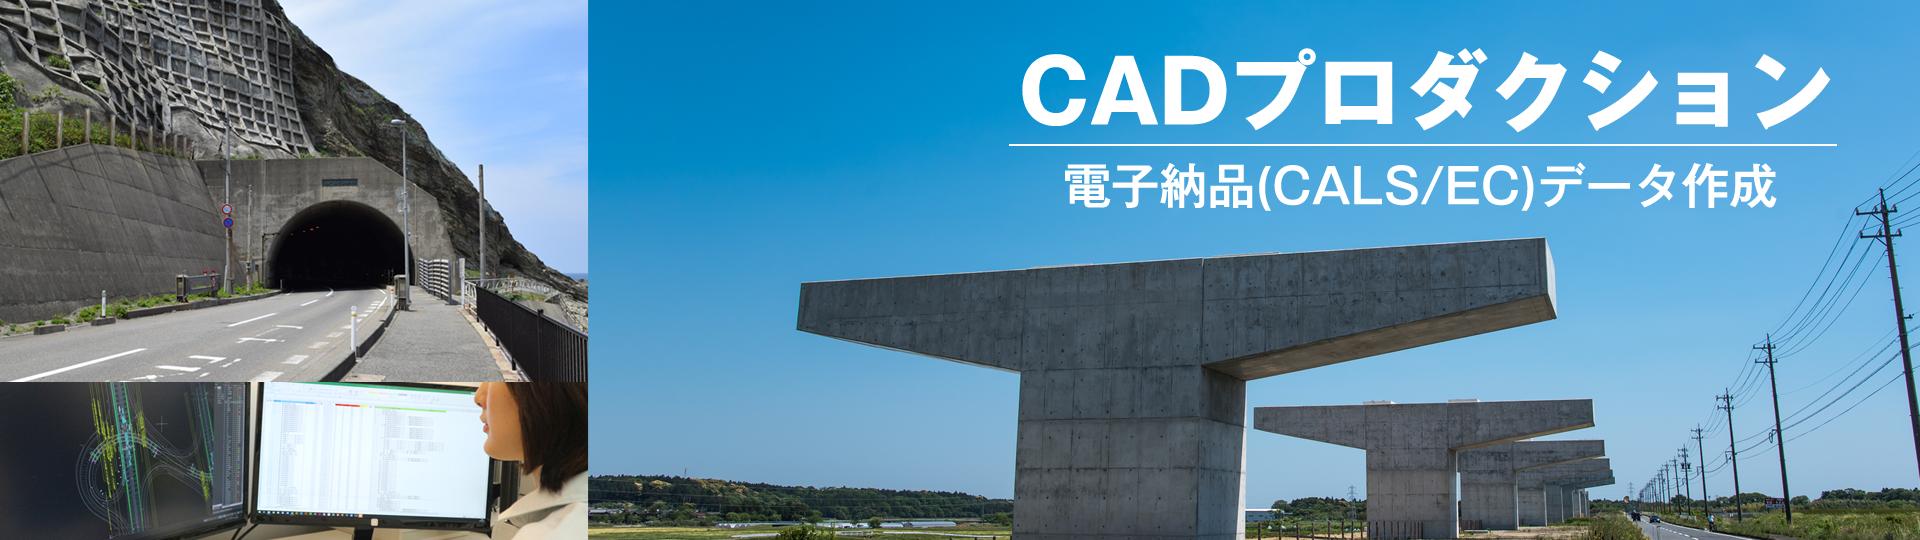 CADプロダクション